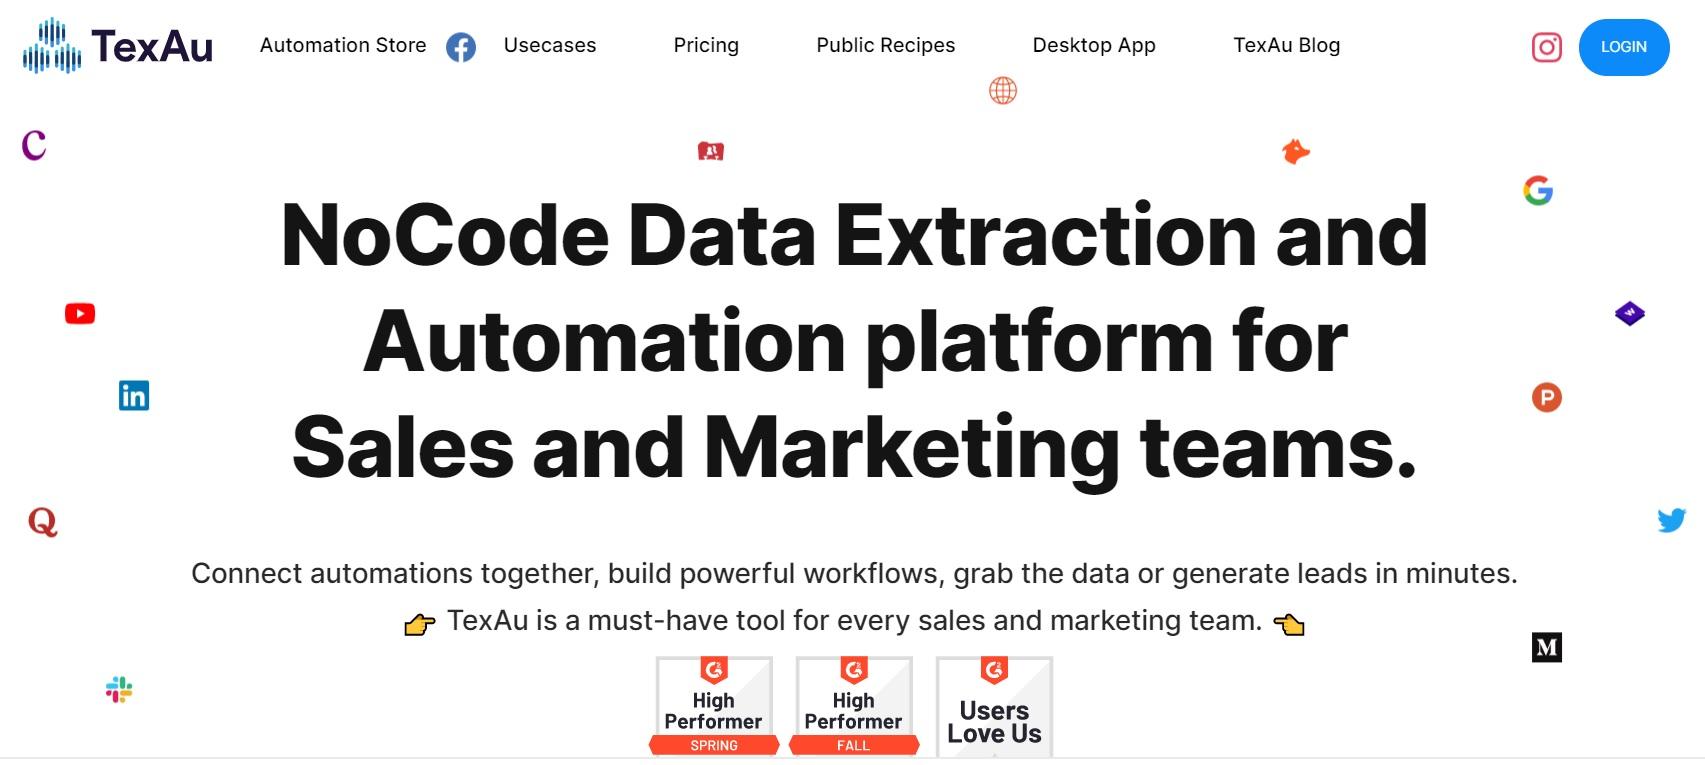 A screenshot of a LinkedIn automation tool, Texau's landing page.